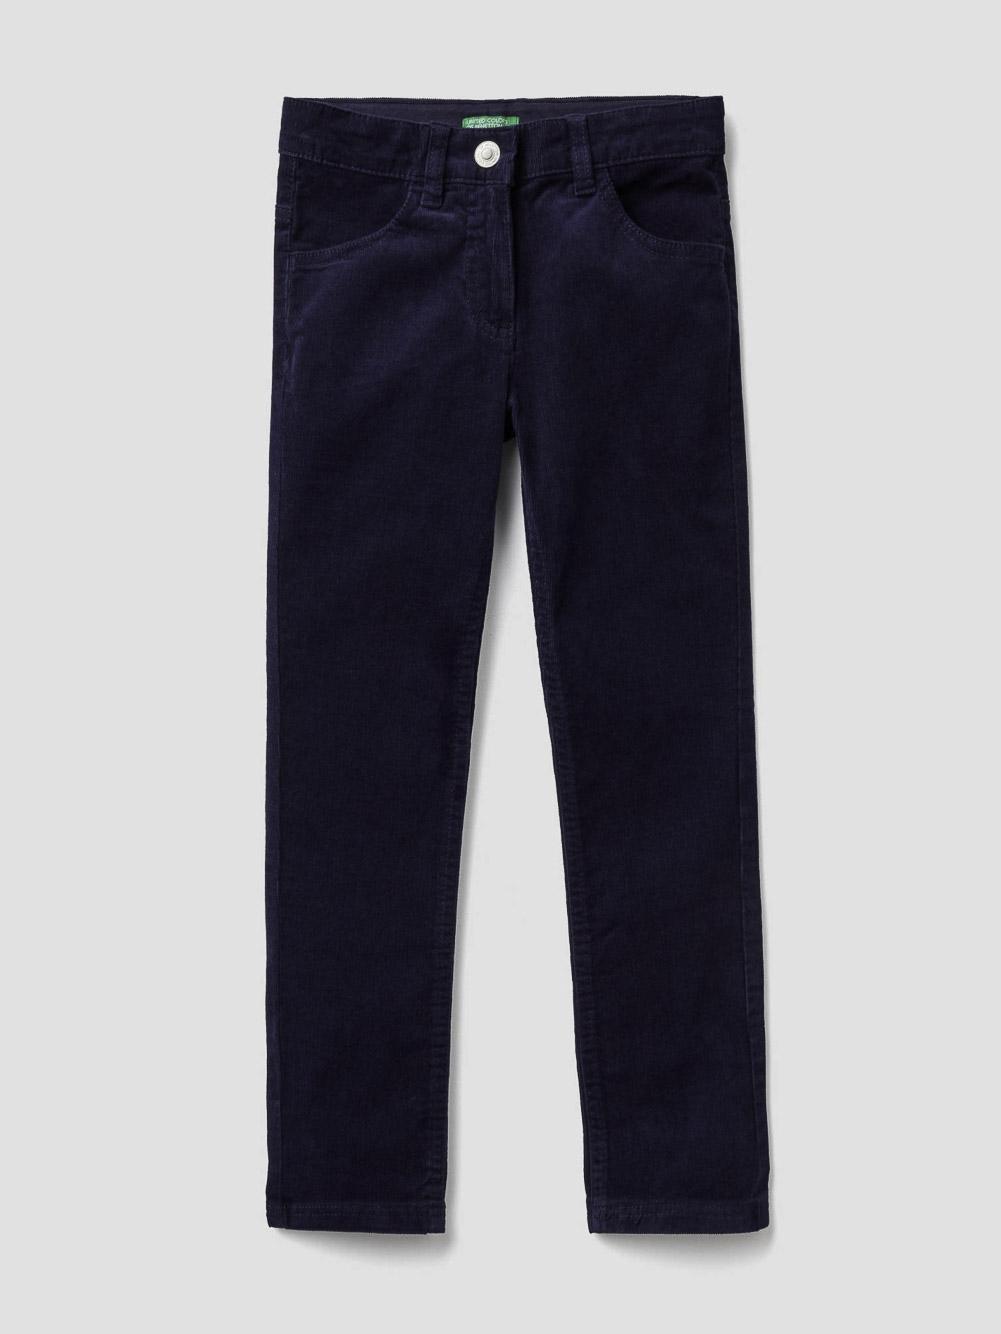 012 BENETTON Παντελόνι από ελαστικό βελούδο 4AD557ME0 20A252